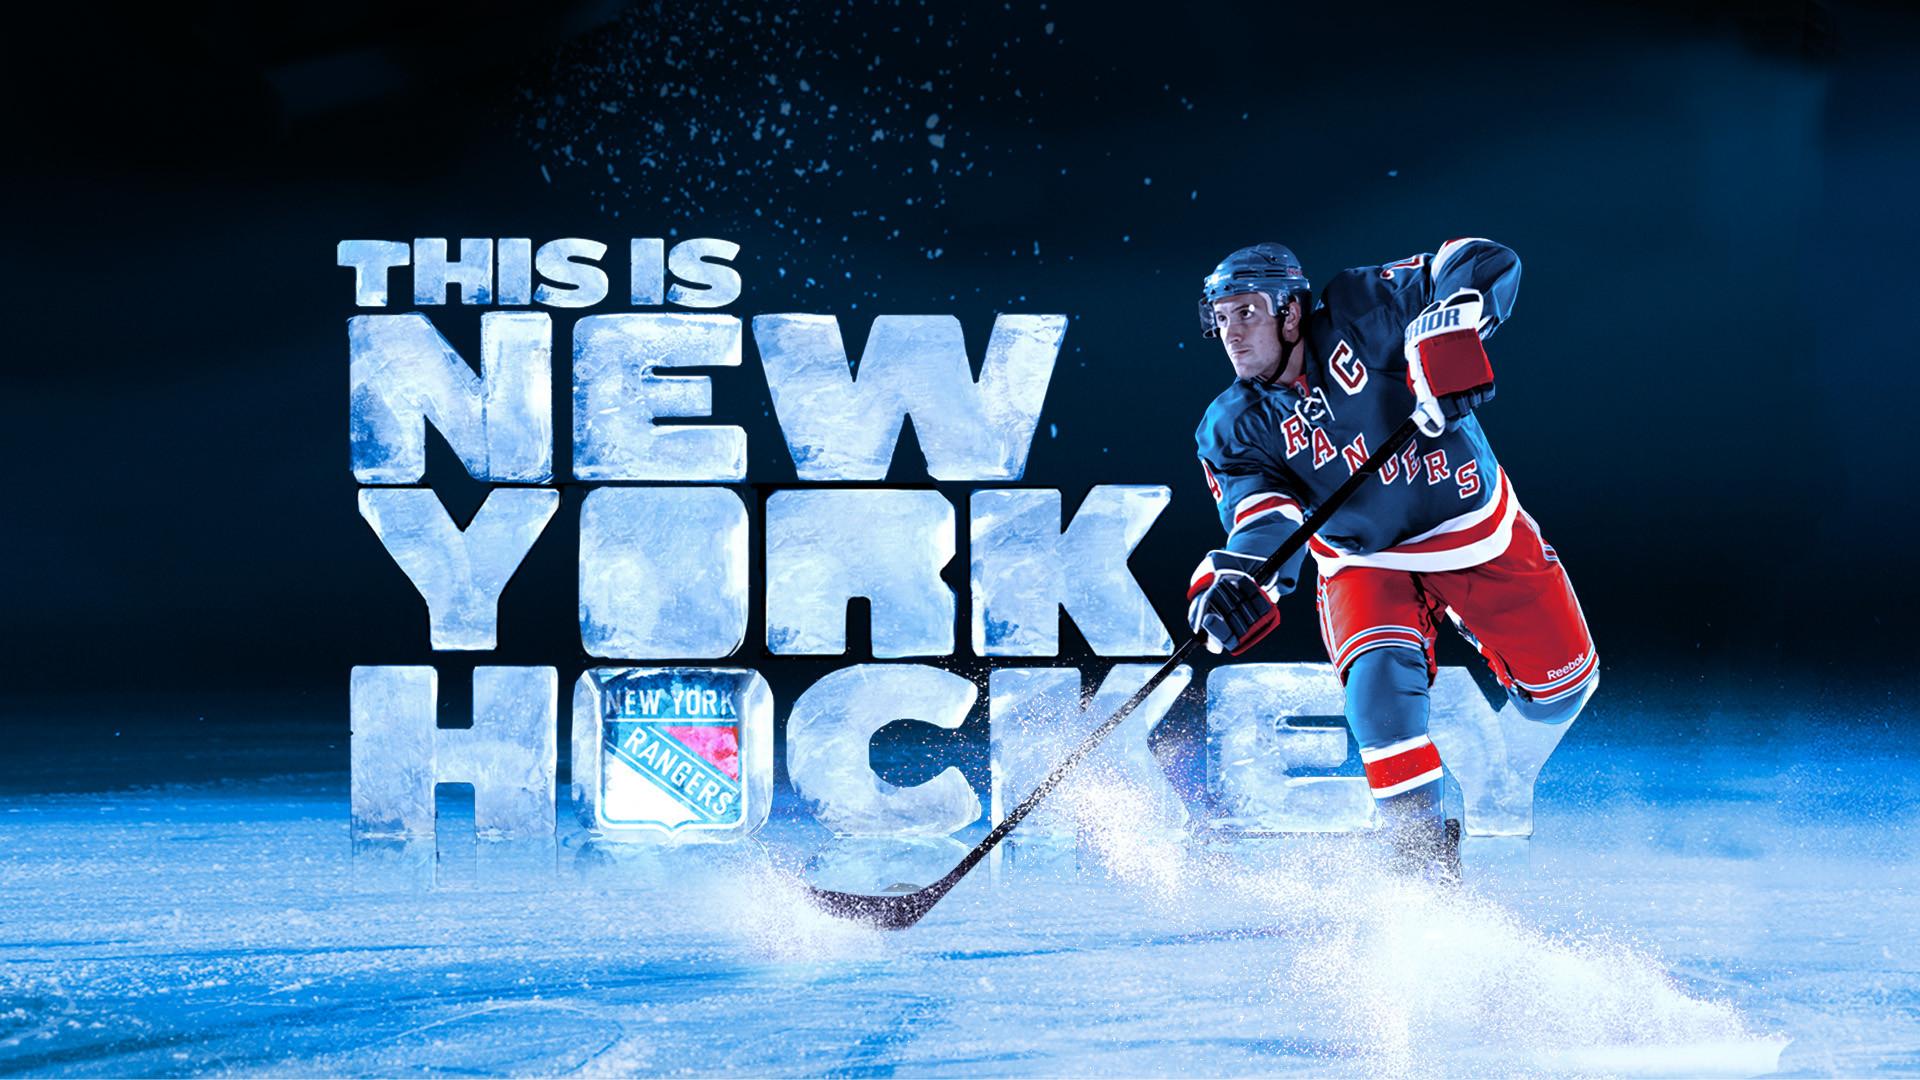 1920x1080. 1920x1080. Download · 1920x1200 New York Rangers Wallpaper. 1920x1200 New York Rangers Wallpaper